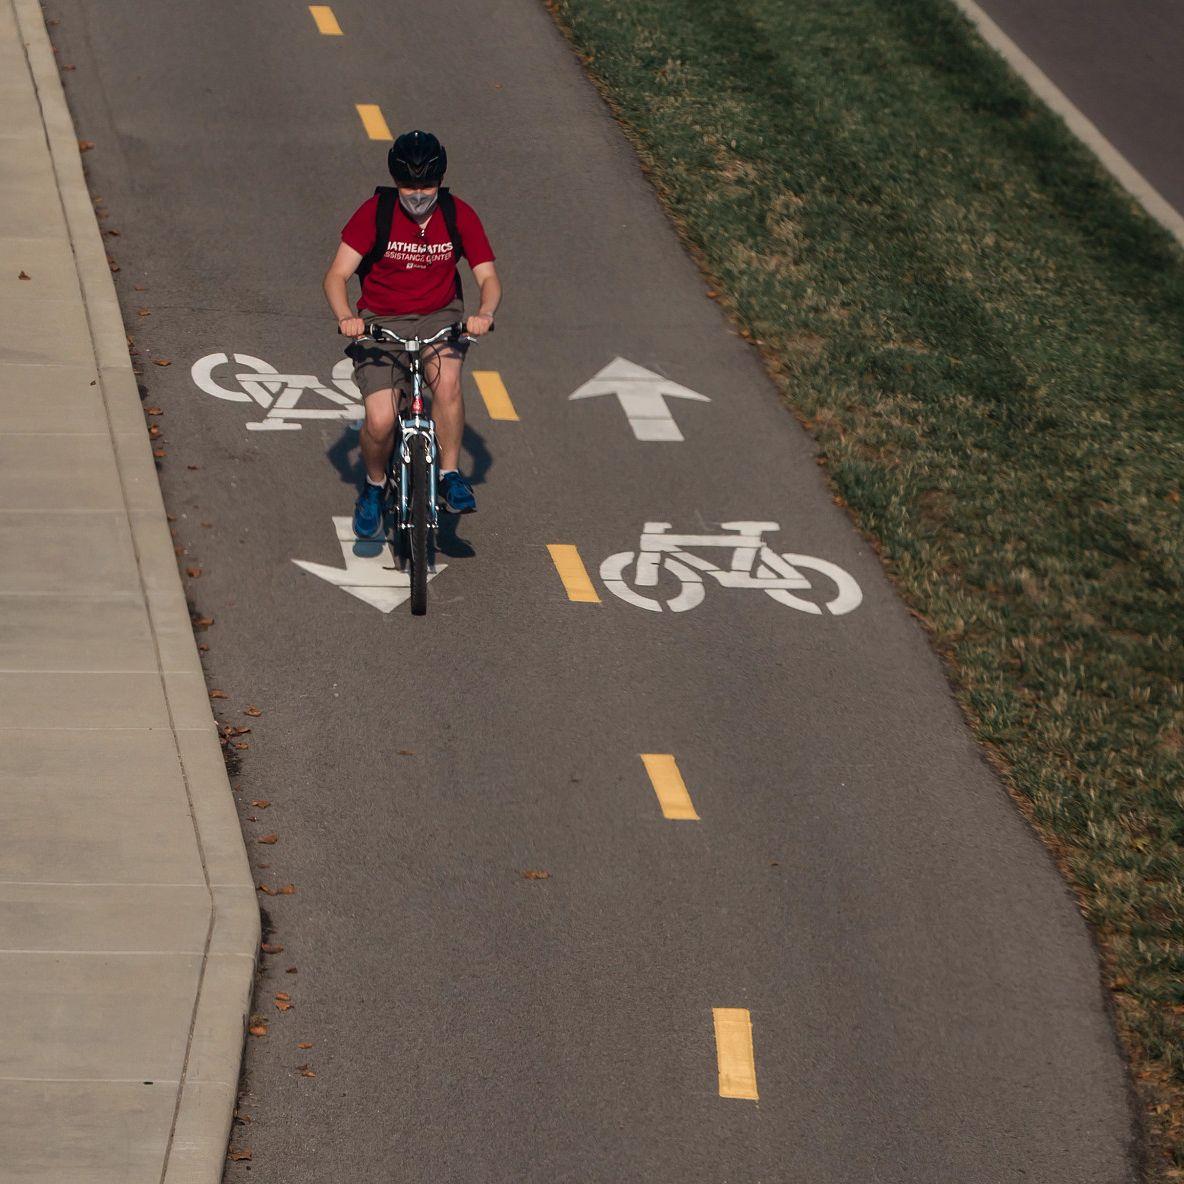 student riding a bike in a bike lane